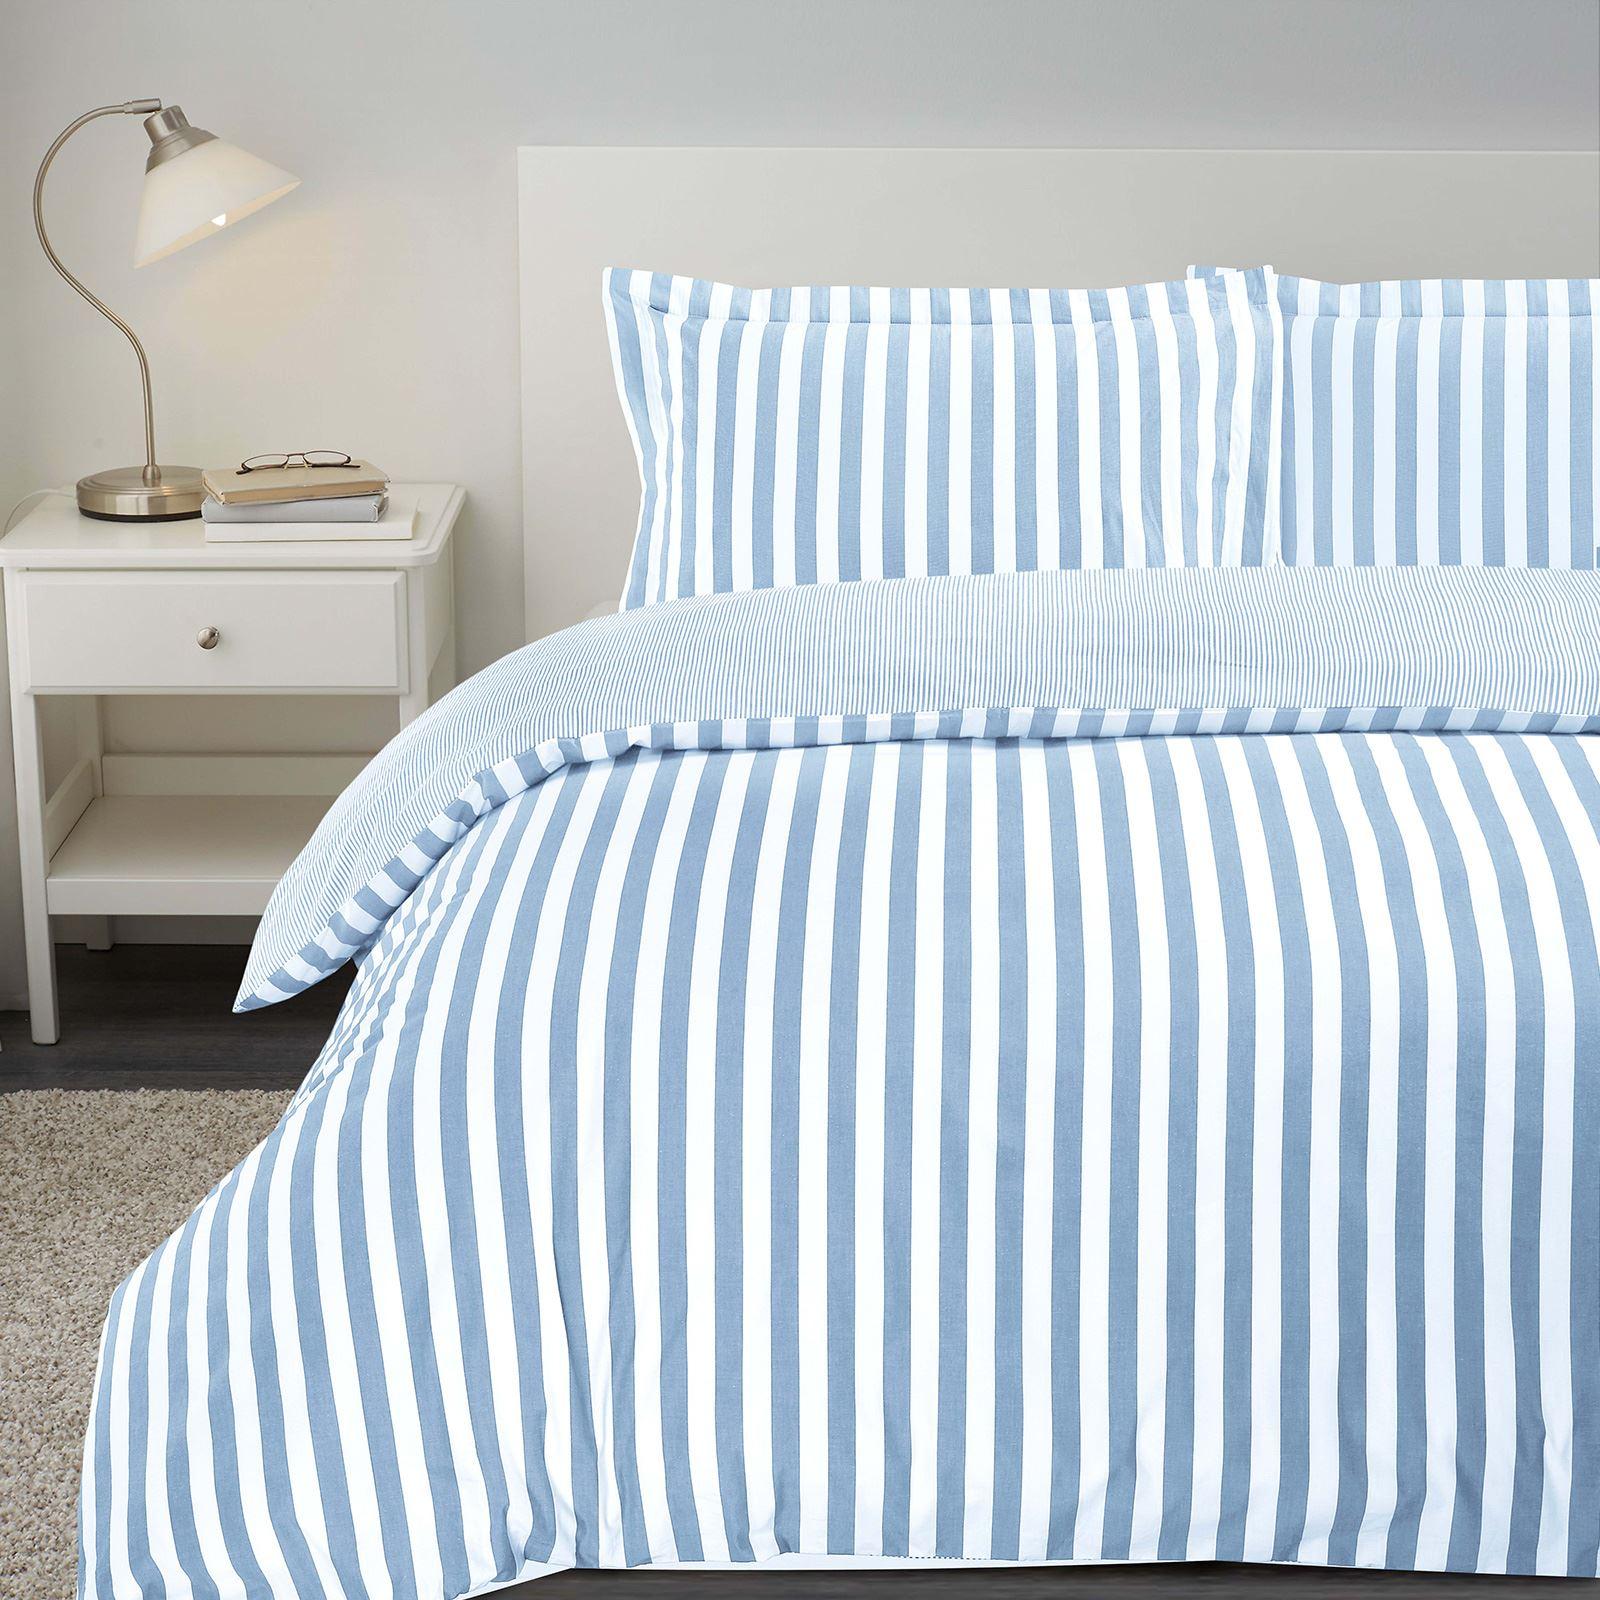 Vertical Stripe Woven 100/% Cotton T200 Reversible Duvet Cover Bedding Set